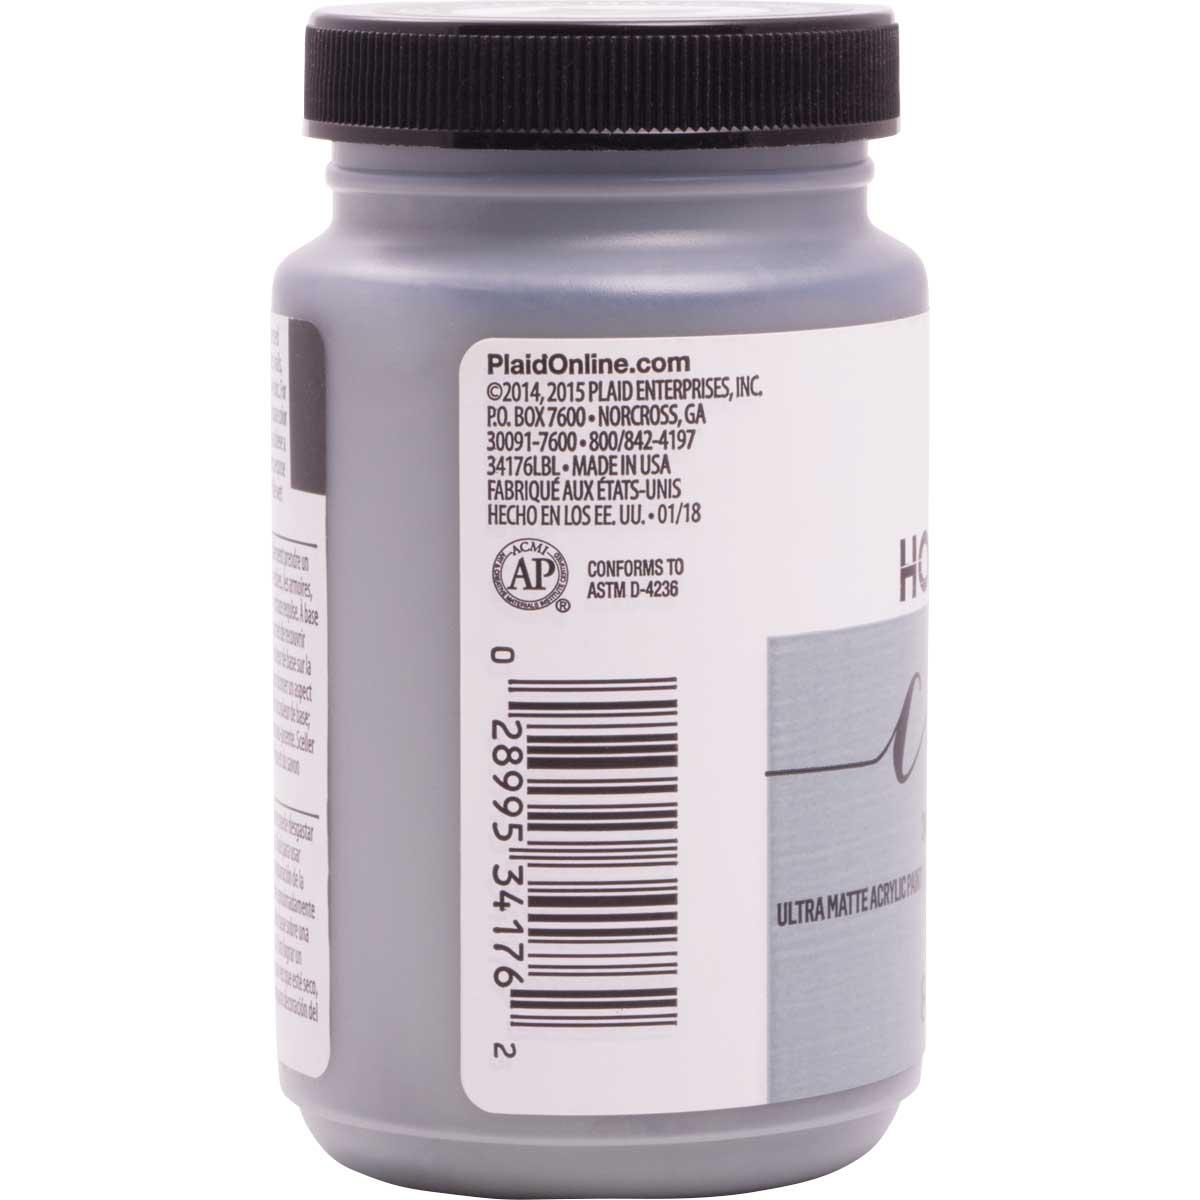 FolkArt ® Home Decor™  Chalk - Hazy, 8 oz. - 34176